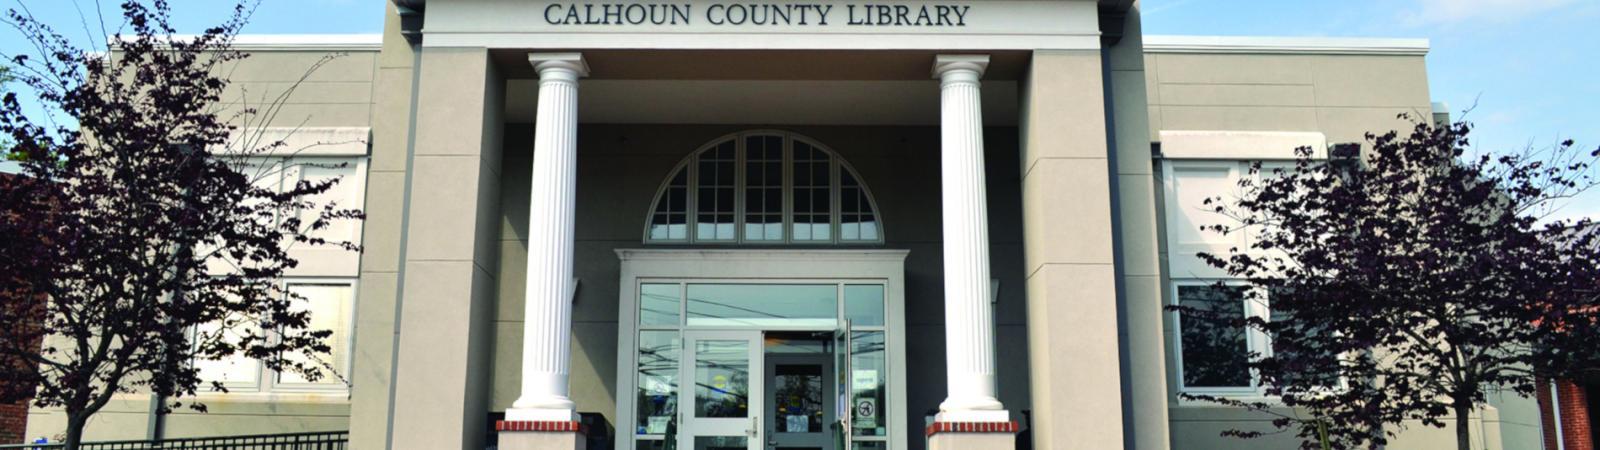 Calhoun County | South Carolina Association of Counties